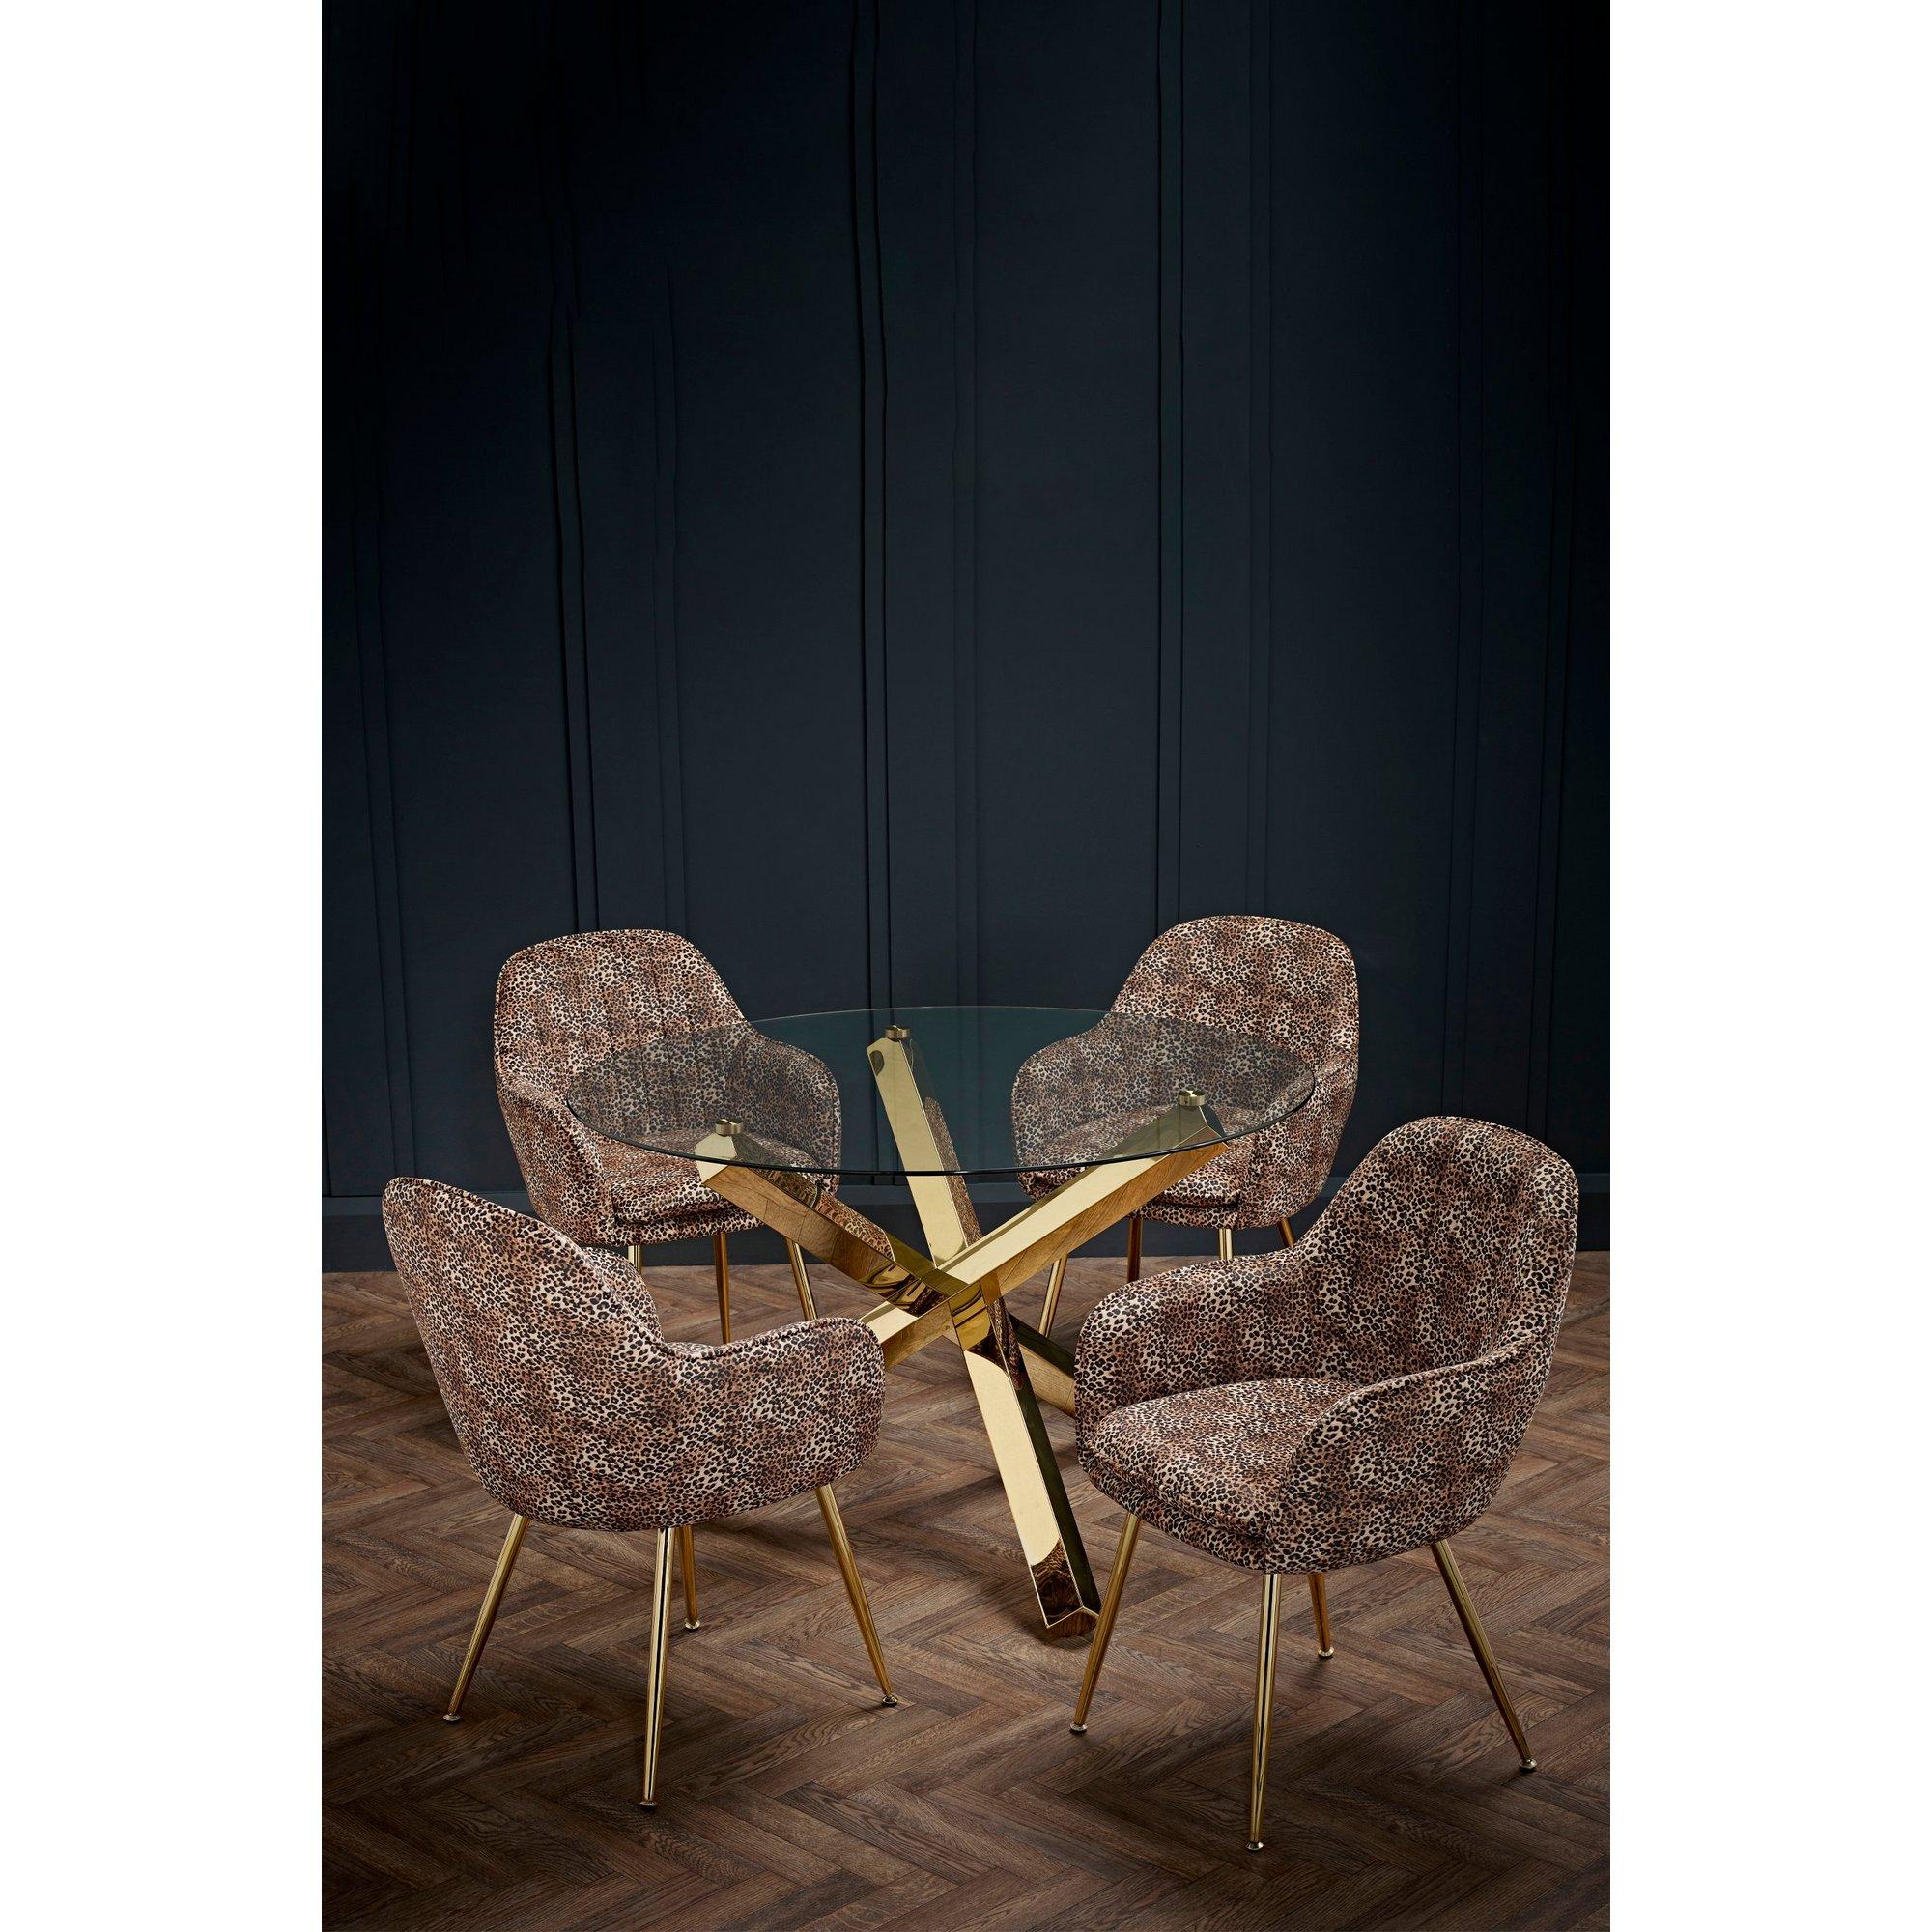 Image of Capri Dining Set with 4 Lara Leopard Print Chairs